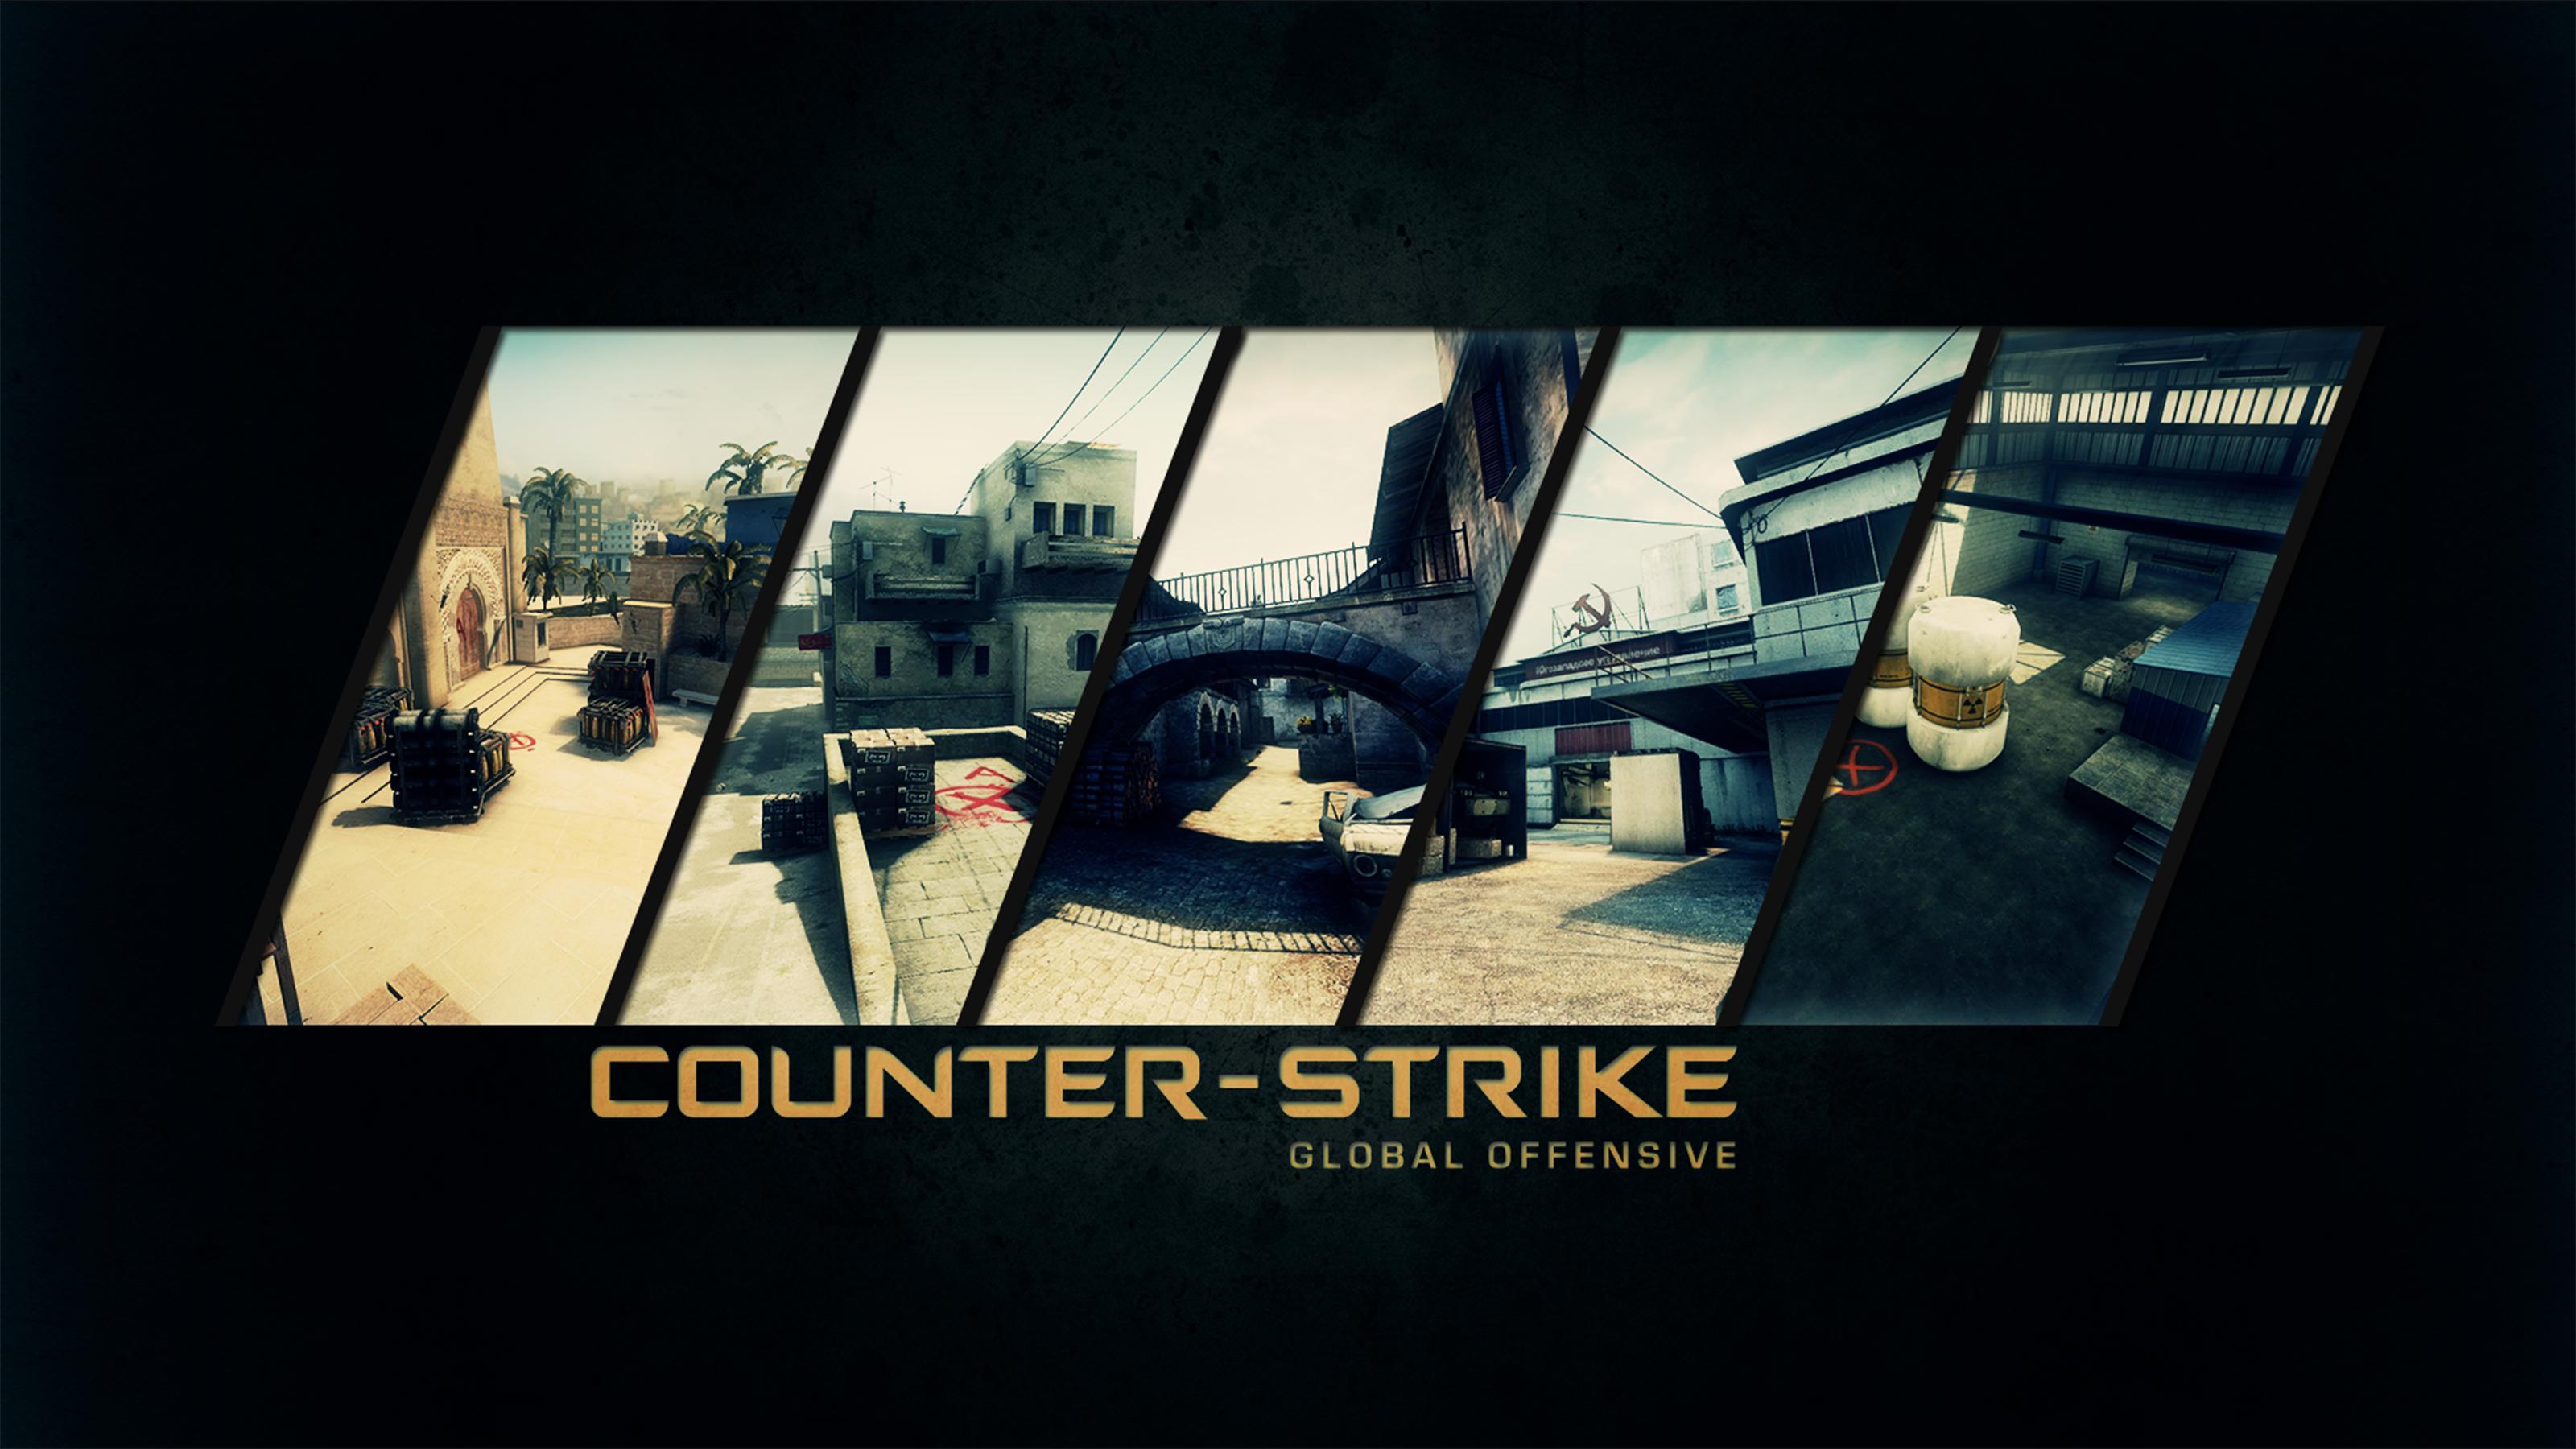 Counter Strike Global Offensive Wallpaper Hintergrundbild HQ 2014 3200x1800